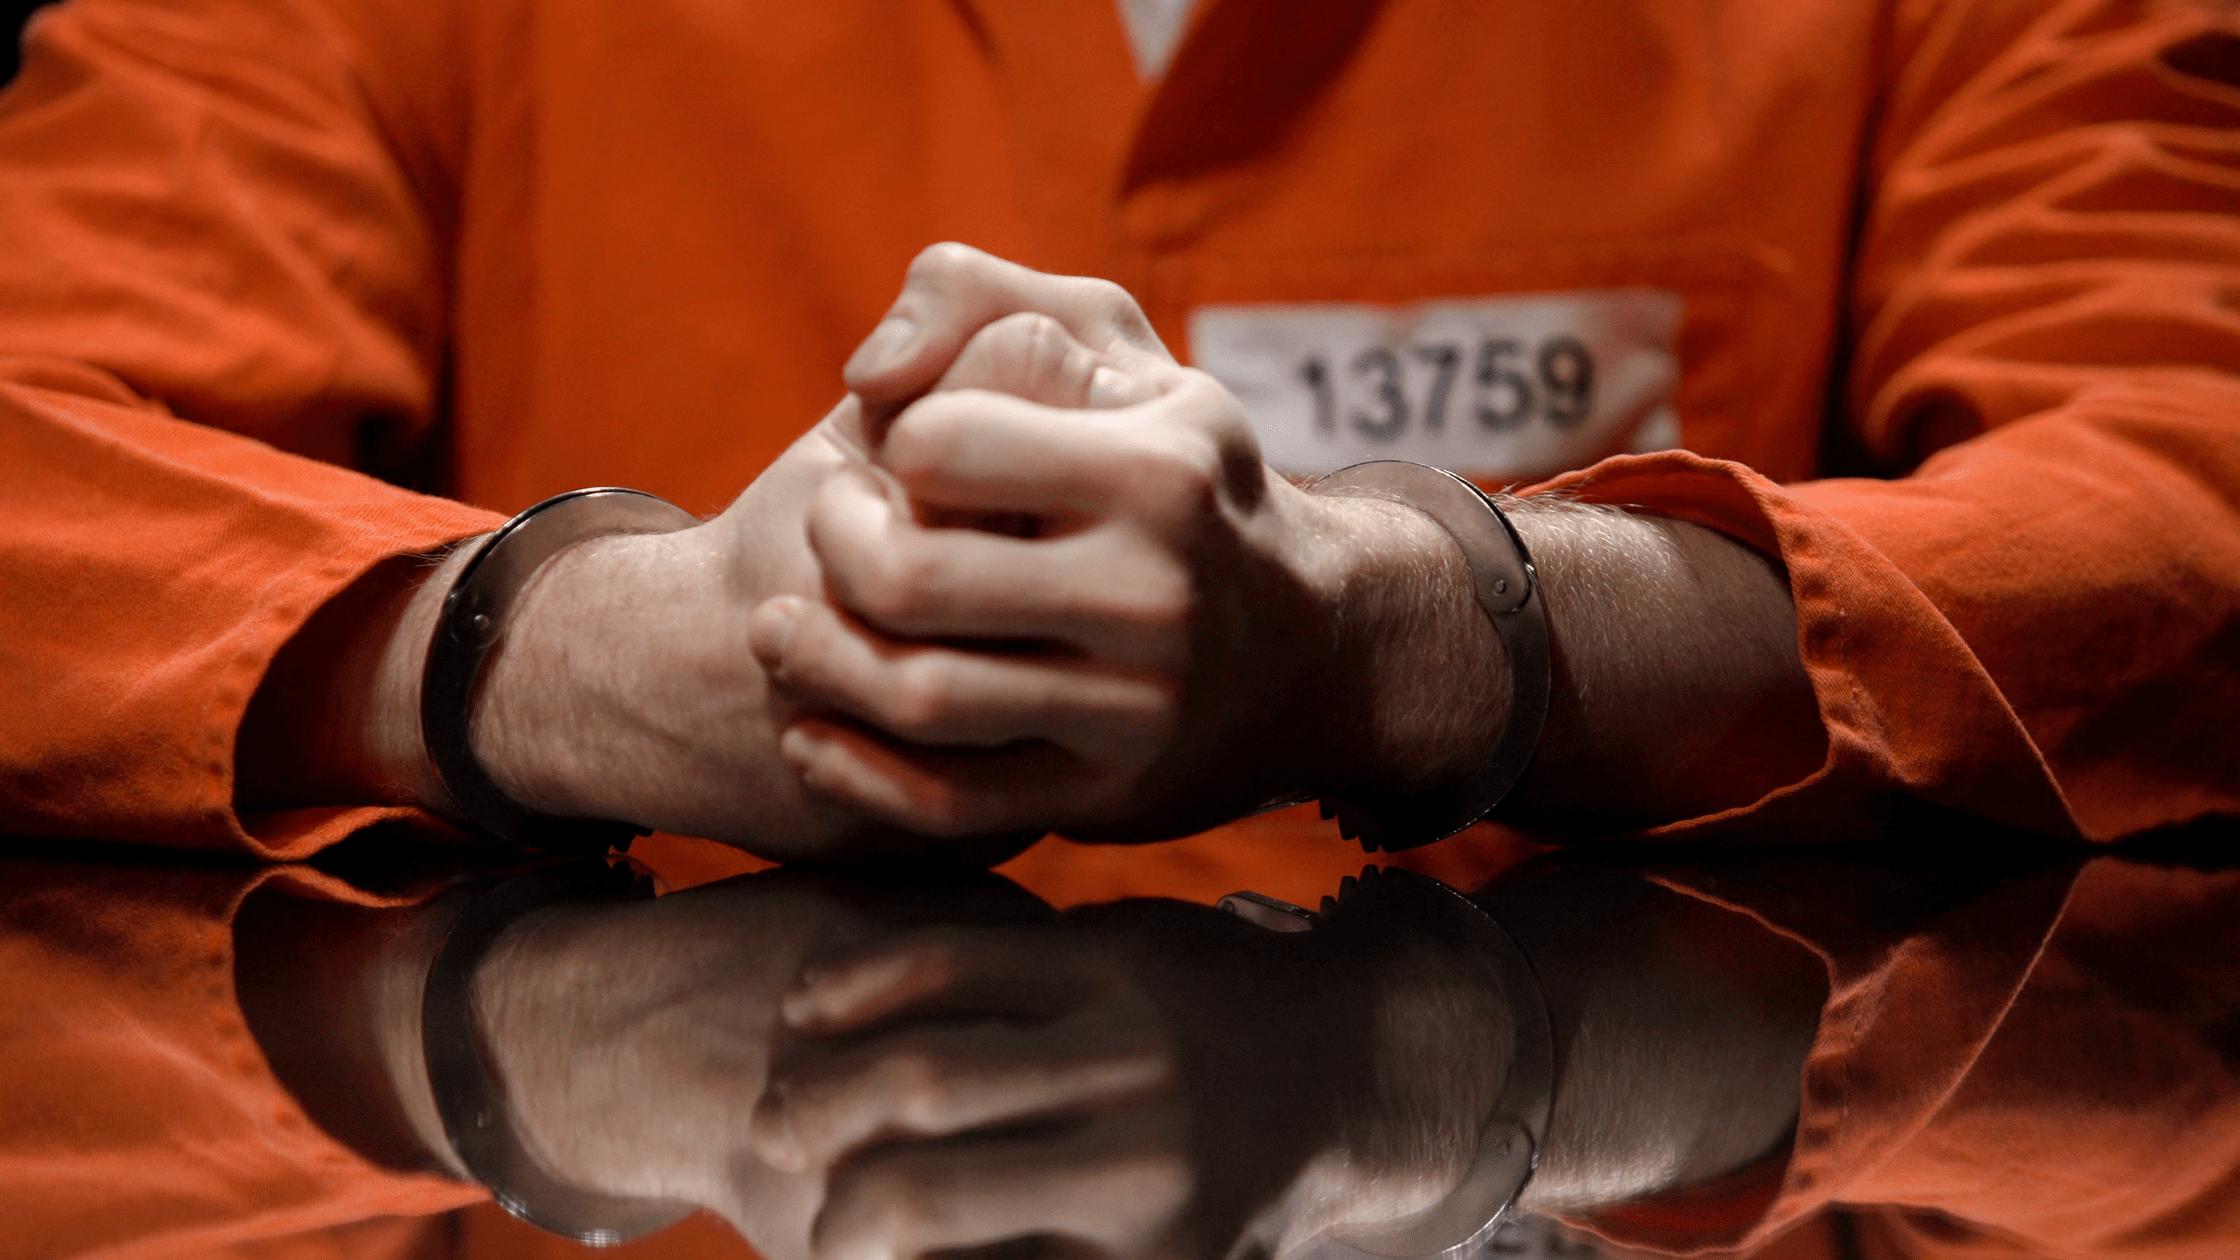 Prisoners & SSI